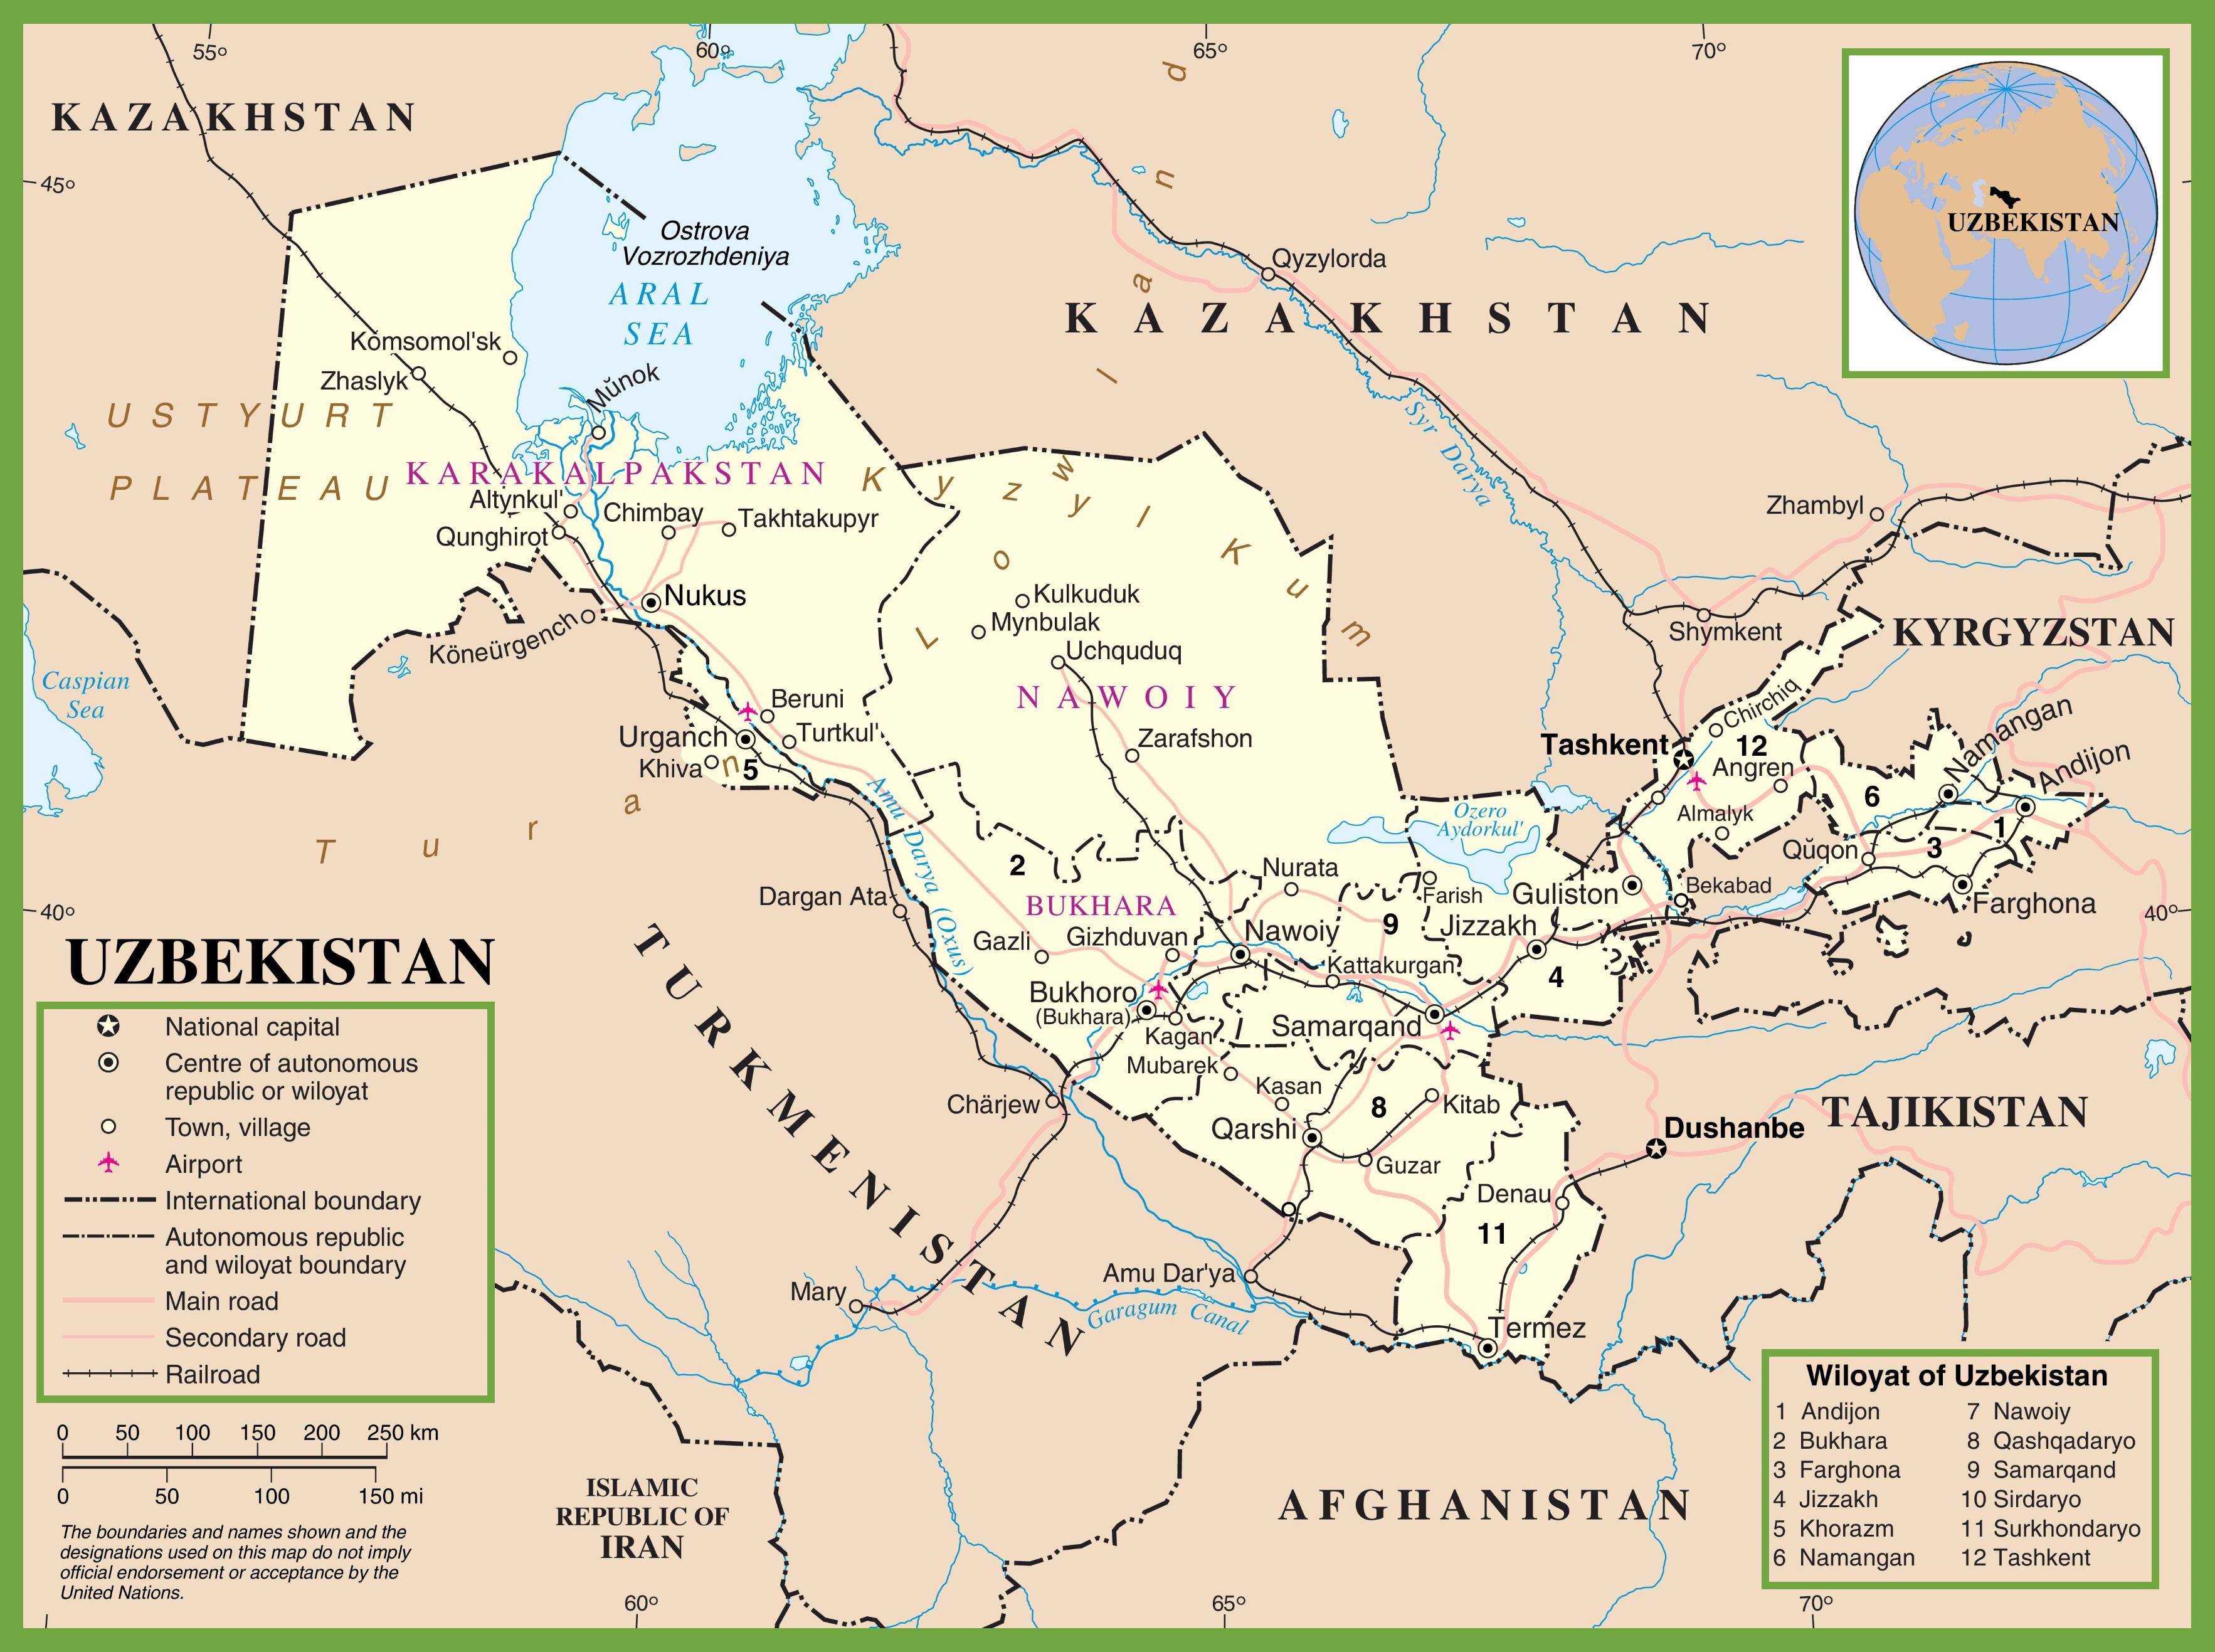 Uzbekistan political map